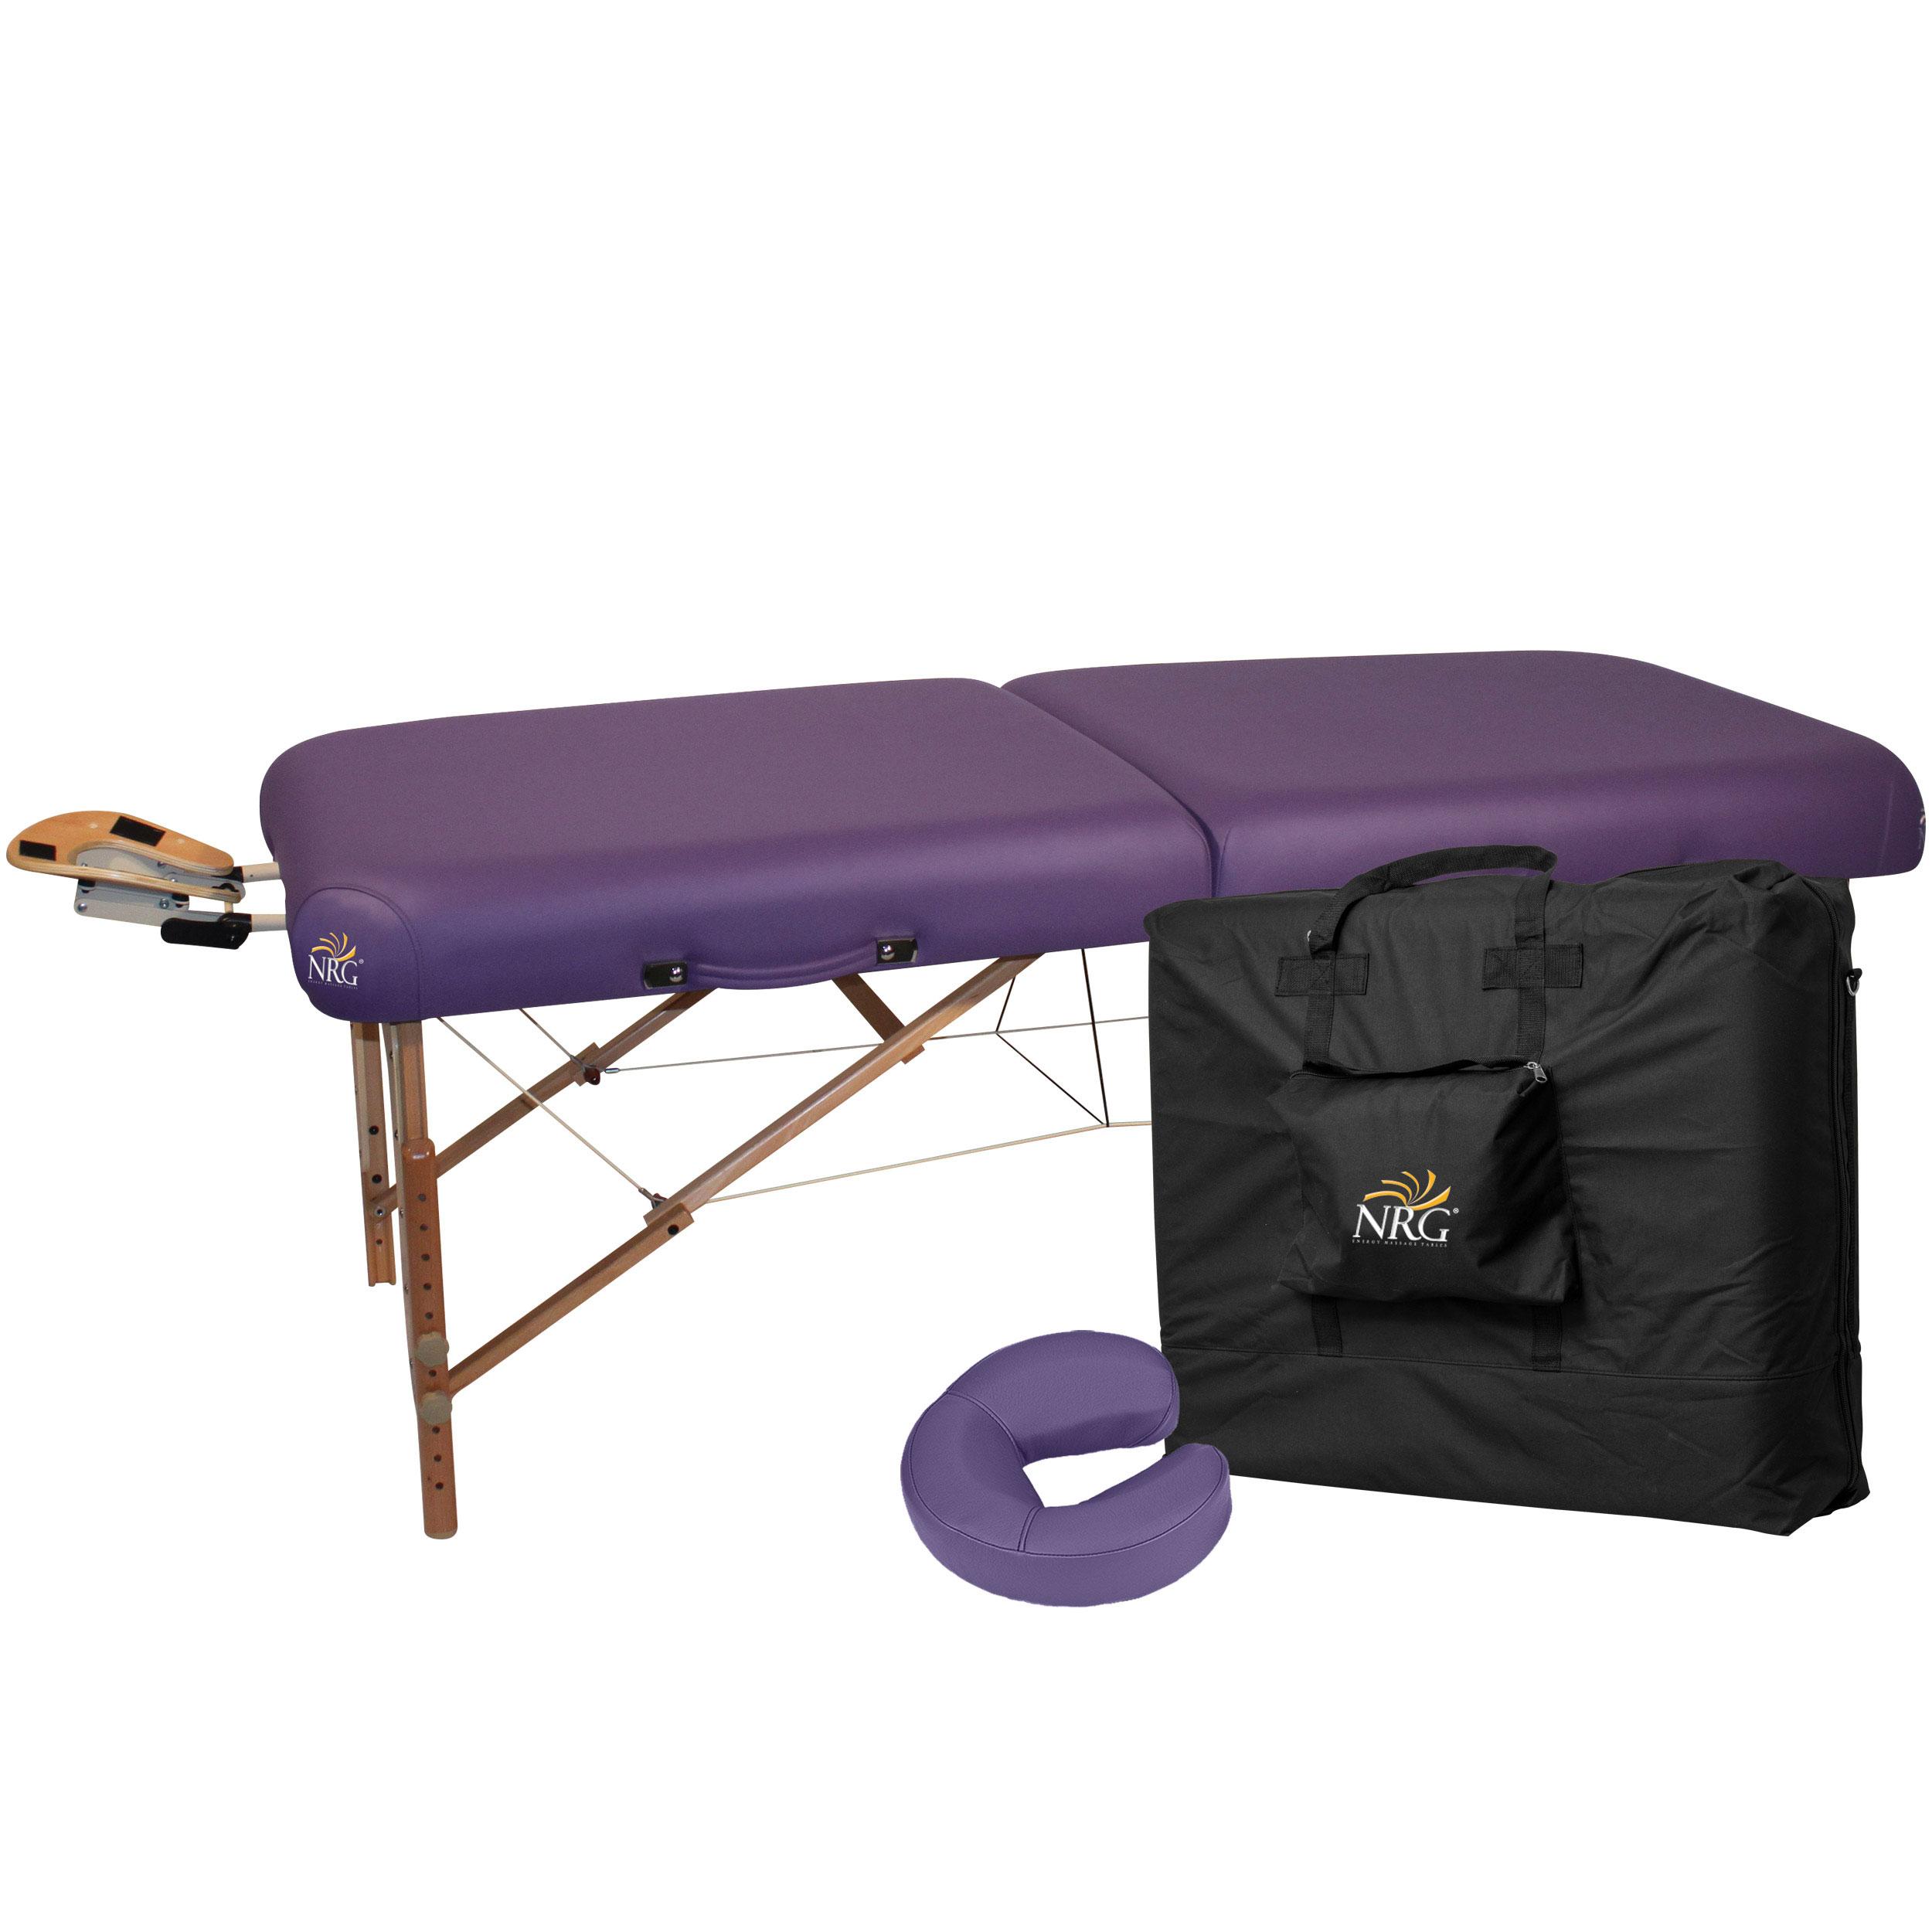 Nrg massage table nrg deluxe portable massage table walmart com nrg vedalux massage table - Portable massage table walmart ...